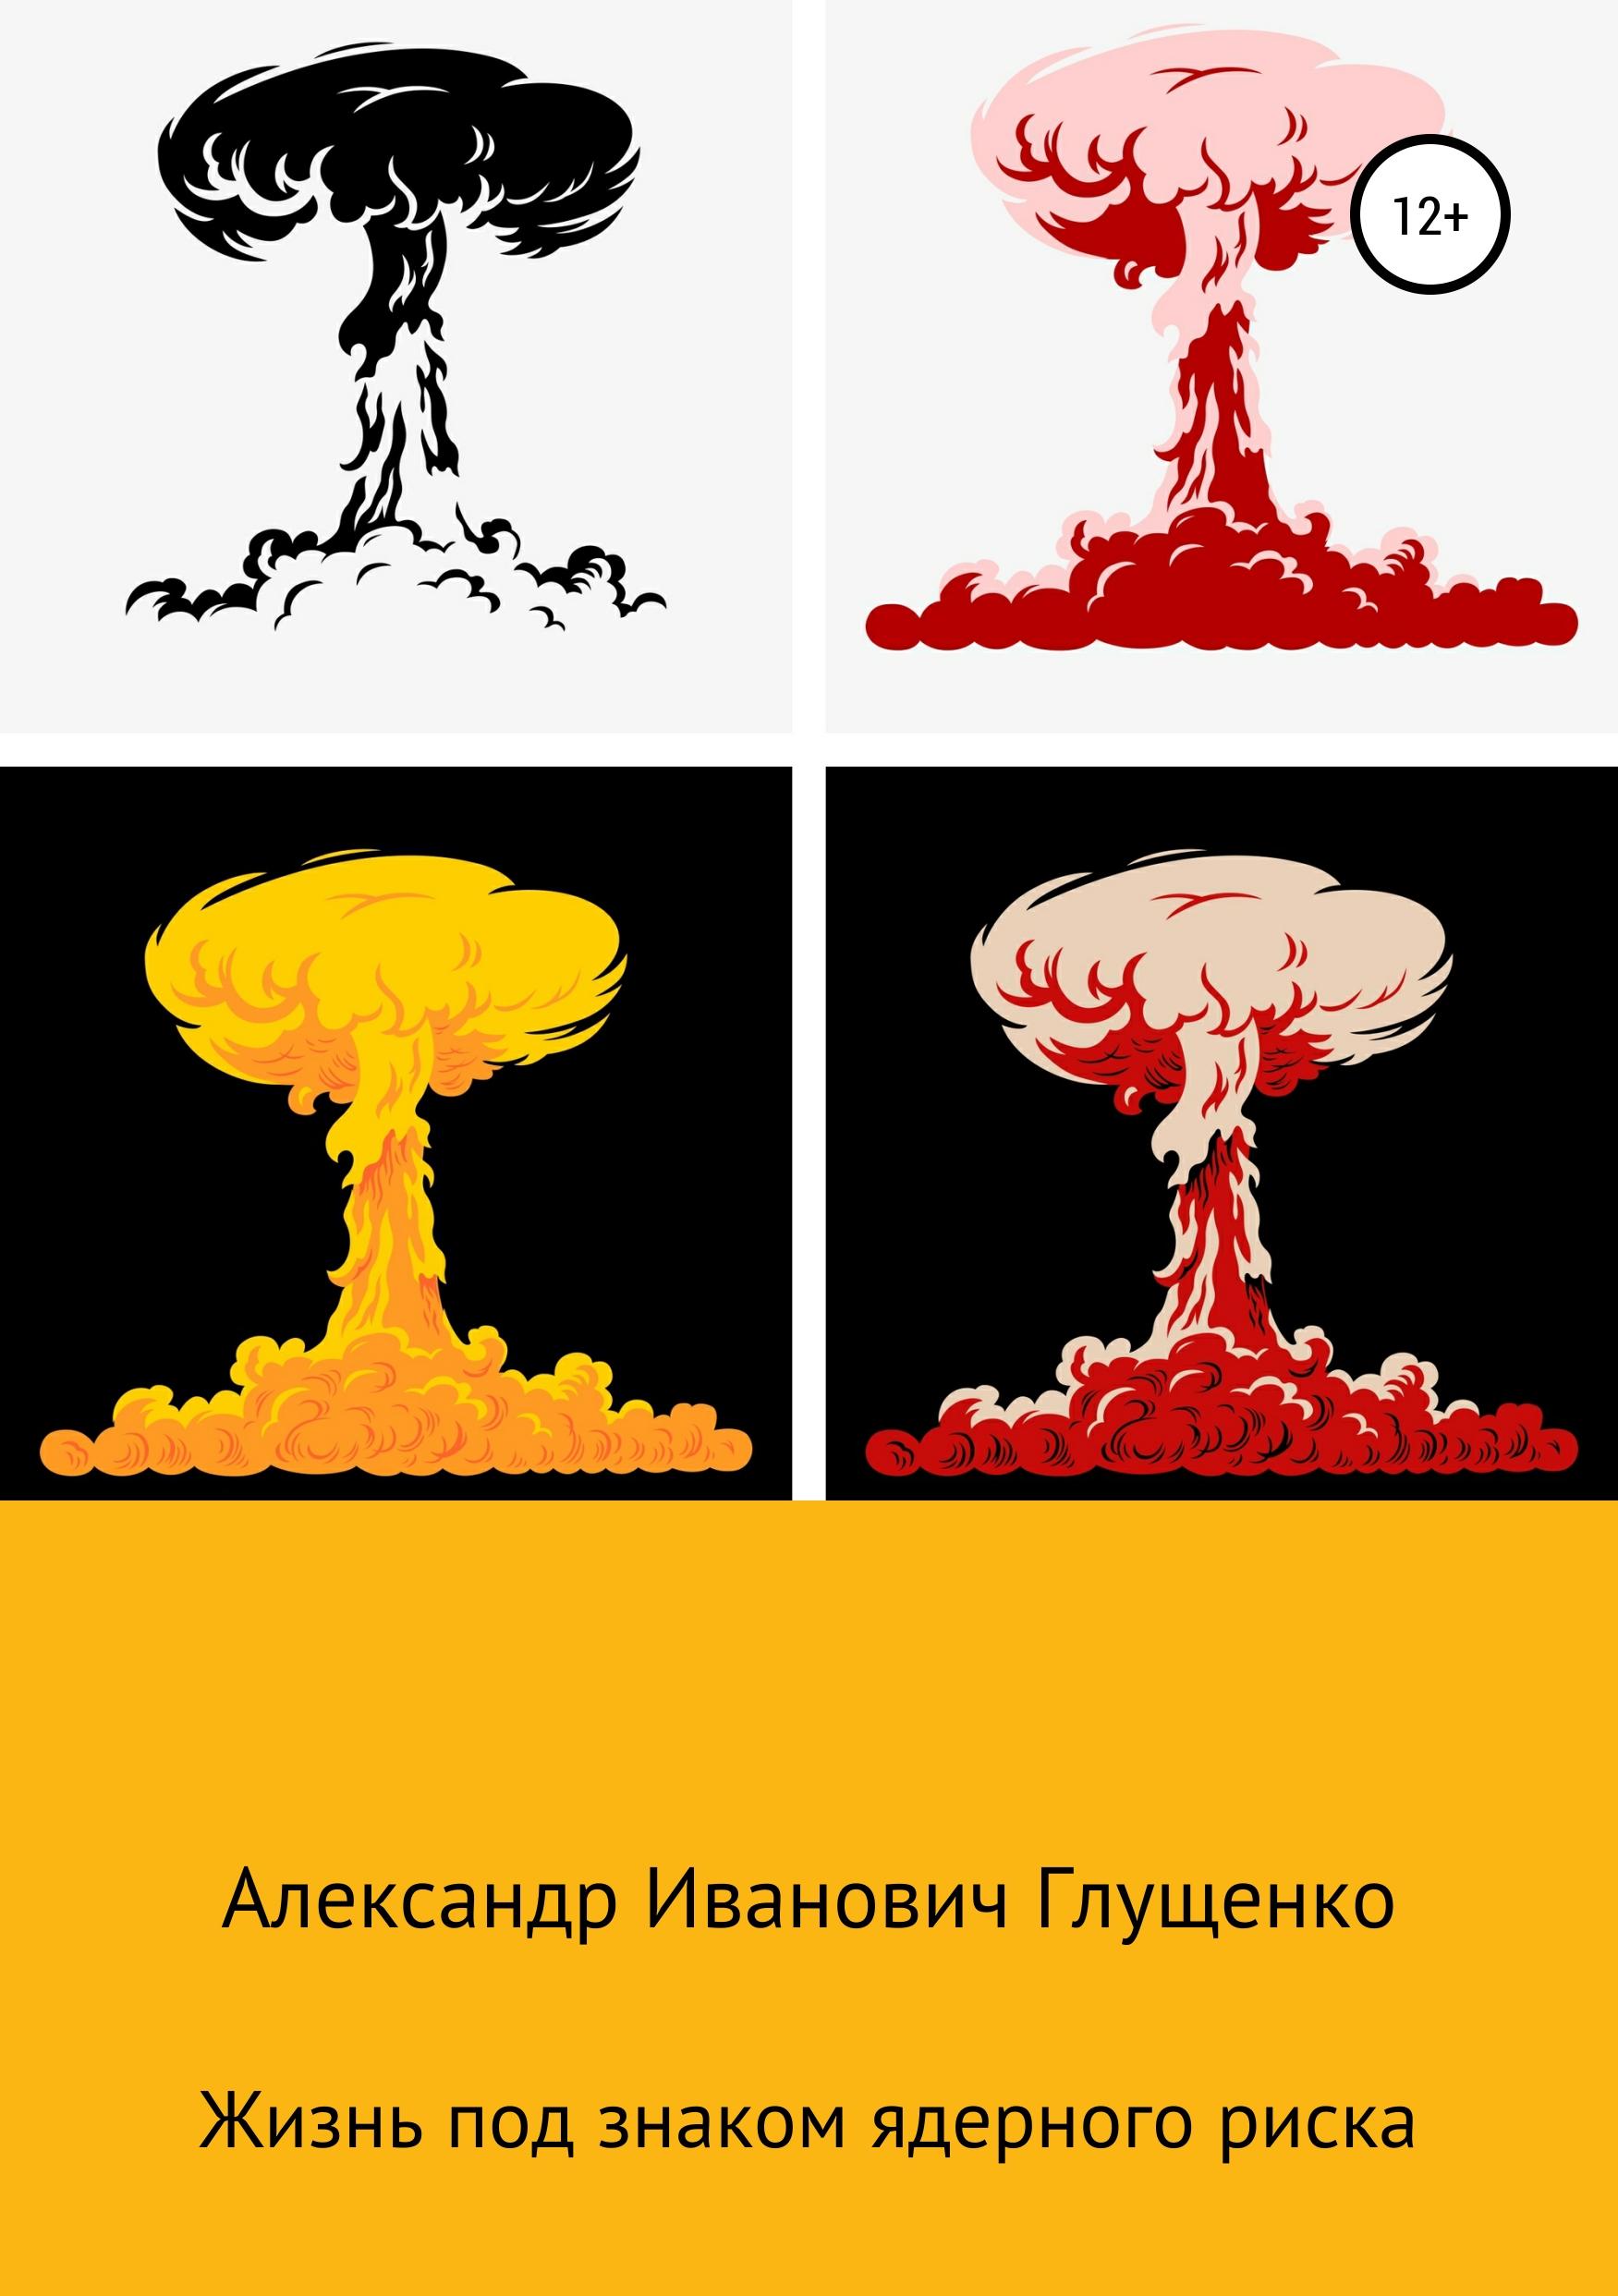 Александр Иванович Глущенко Жизнь под знаком ядерного риска